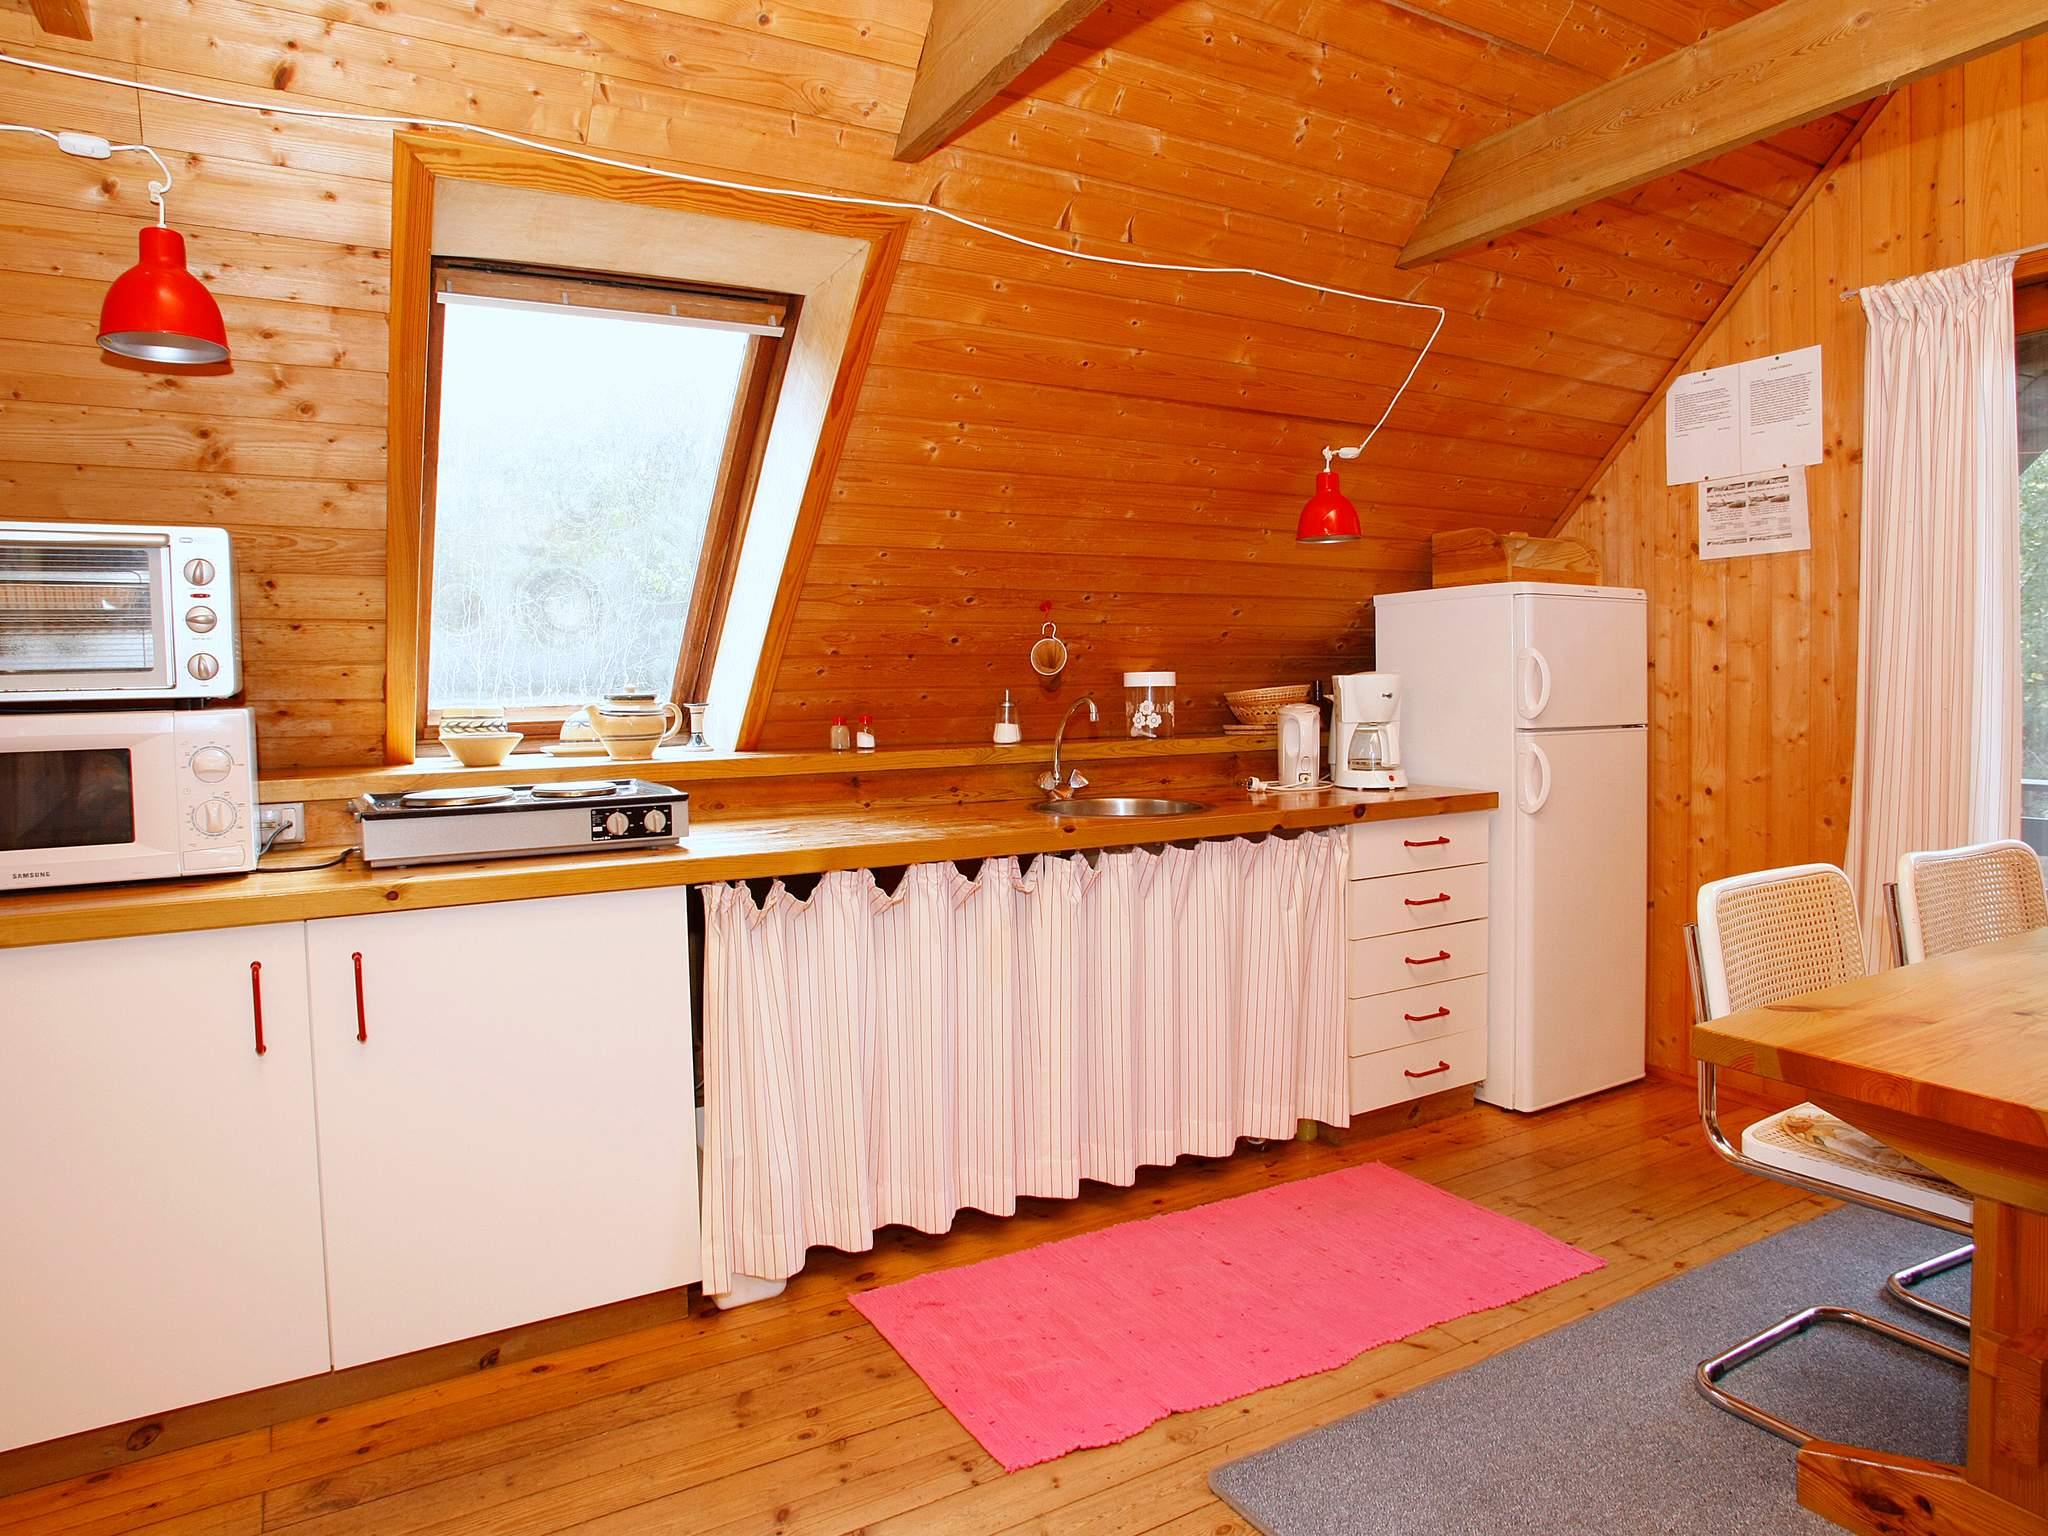 Ferienhaus Læsø/Vesterø (88181), Læsø, , Læsø, Dänemark, Bild 5